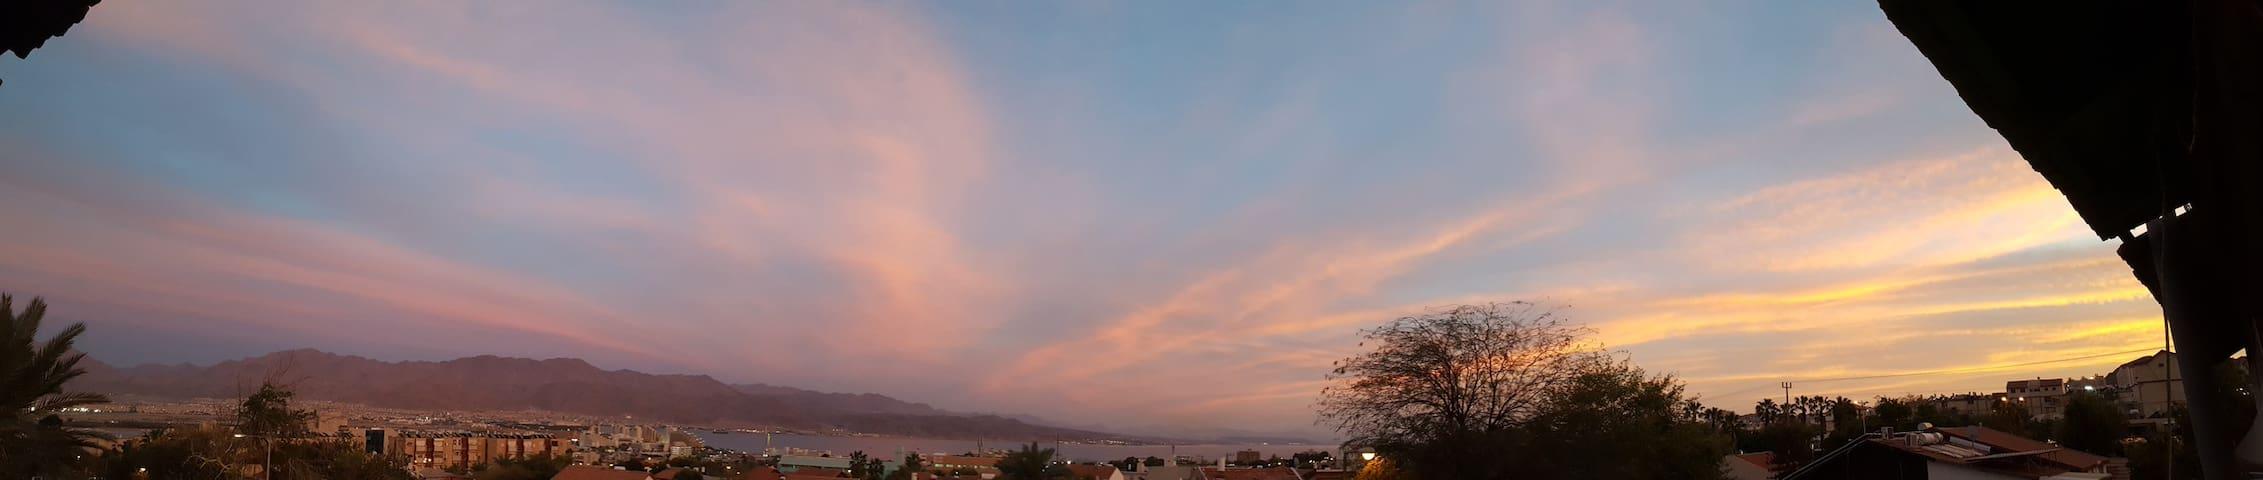 Mirale's Bay View